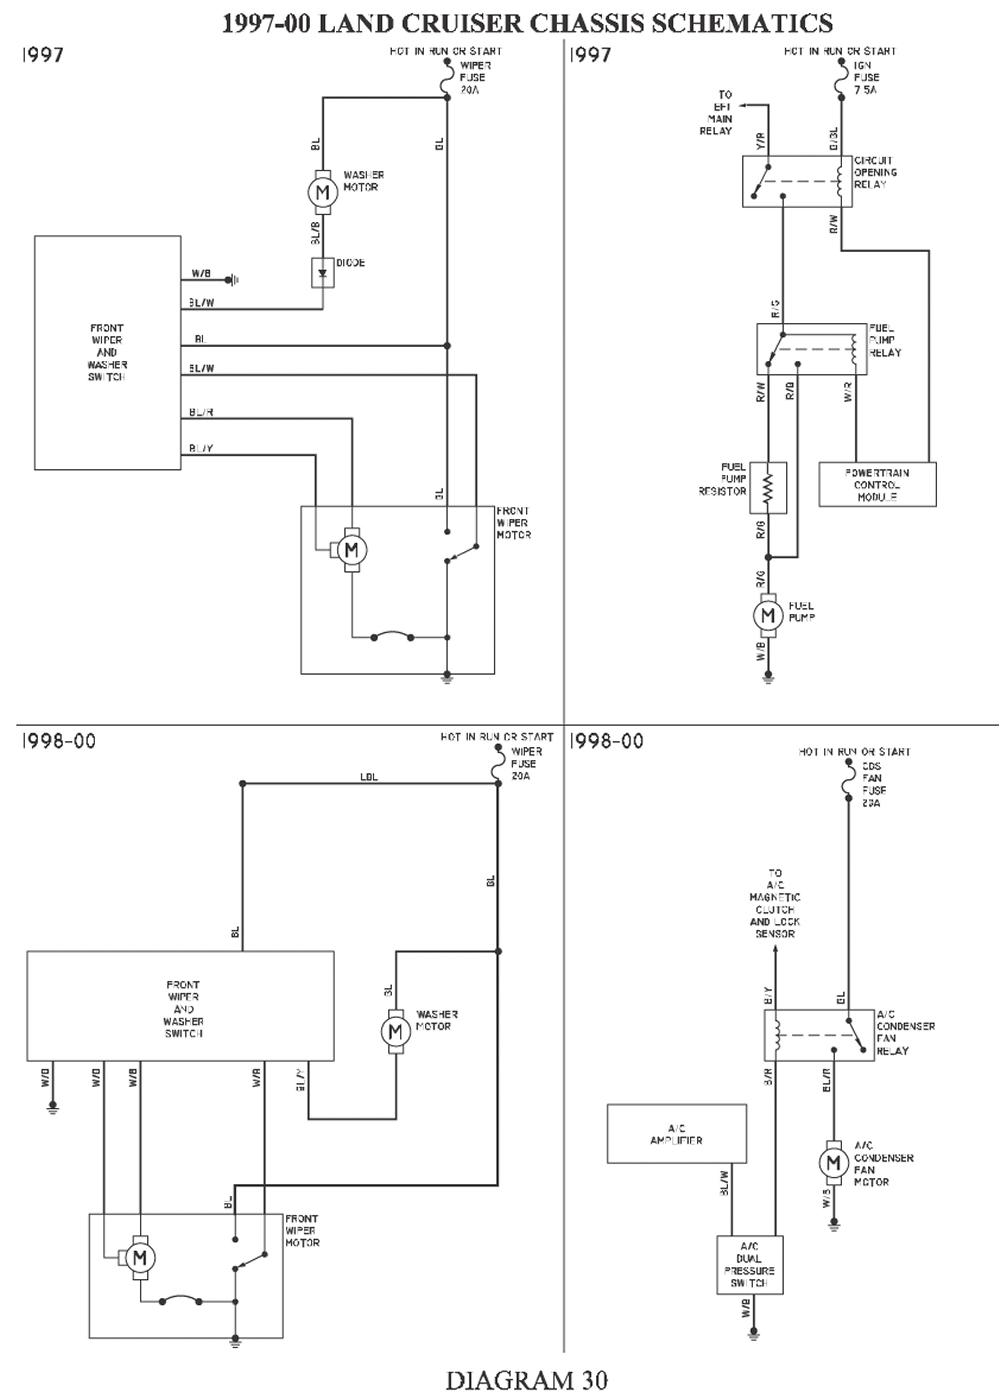 2007 toyota Tacoma Wiring Diagram Yc 1755 toyota Quantum Wiring Diagram Wiring Diagram